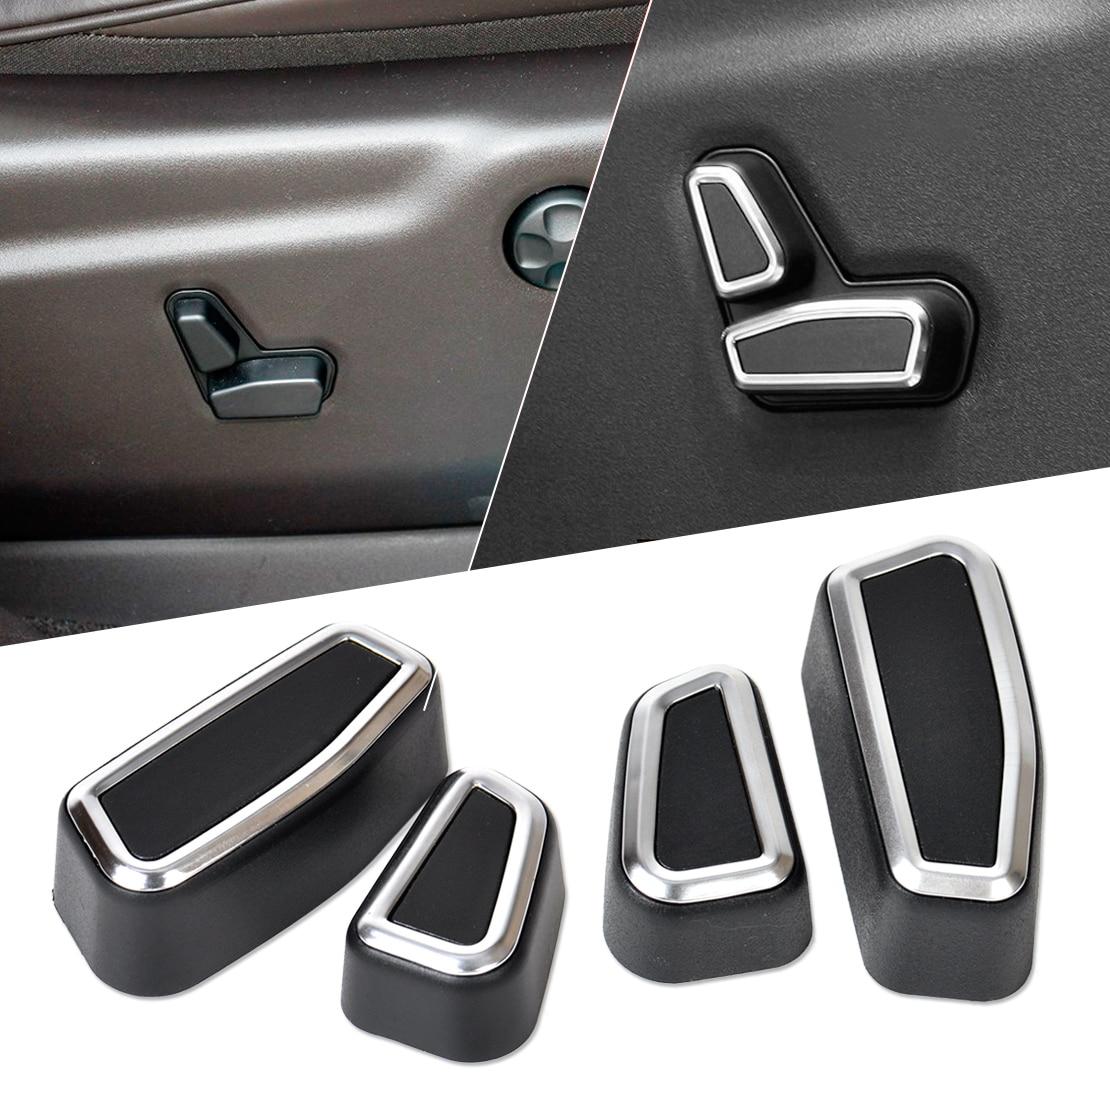 beler 4pcs Front Seat Adjustment Switch Cover for Jeep Grand Cherokee Patriot Chrysler 300C 2011 2012 2013 2014 2015 chrysler grand voyager с пробегом москва